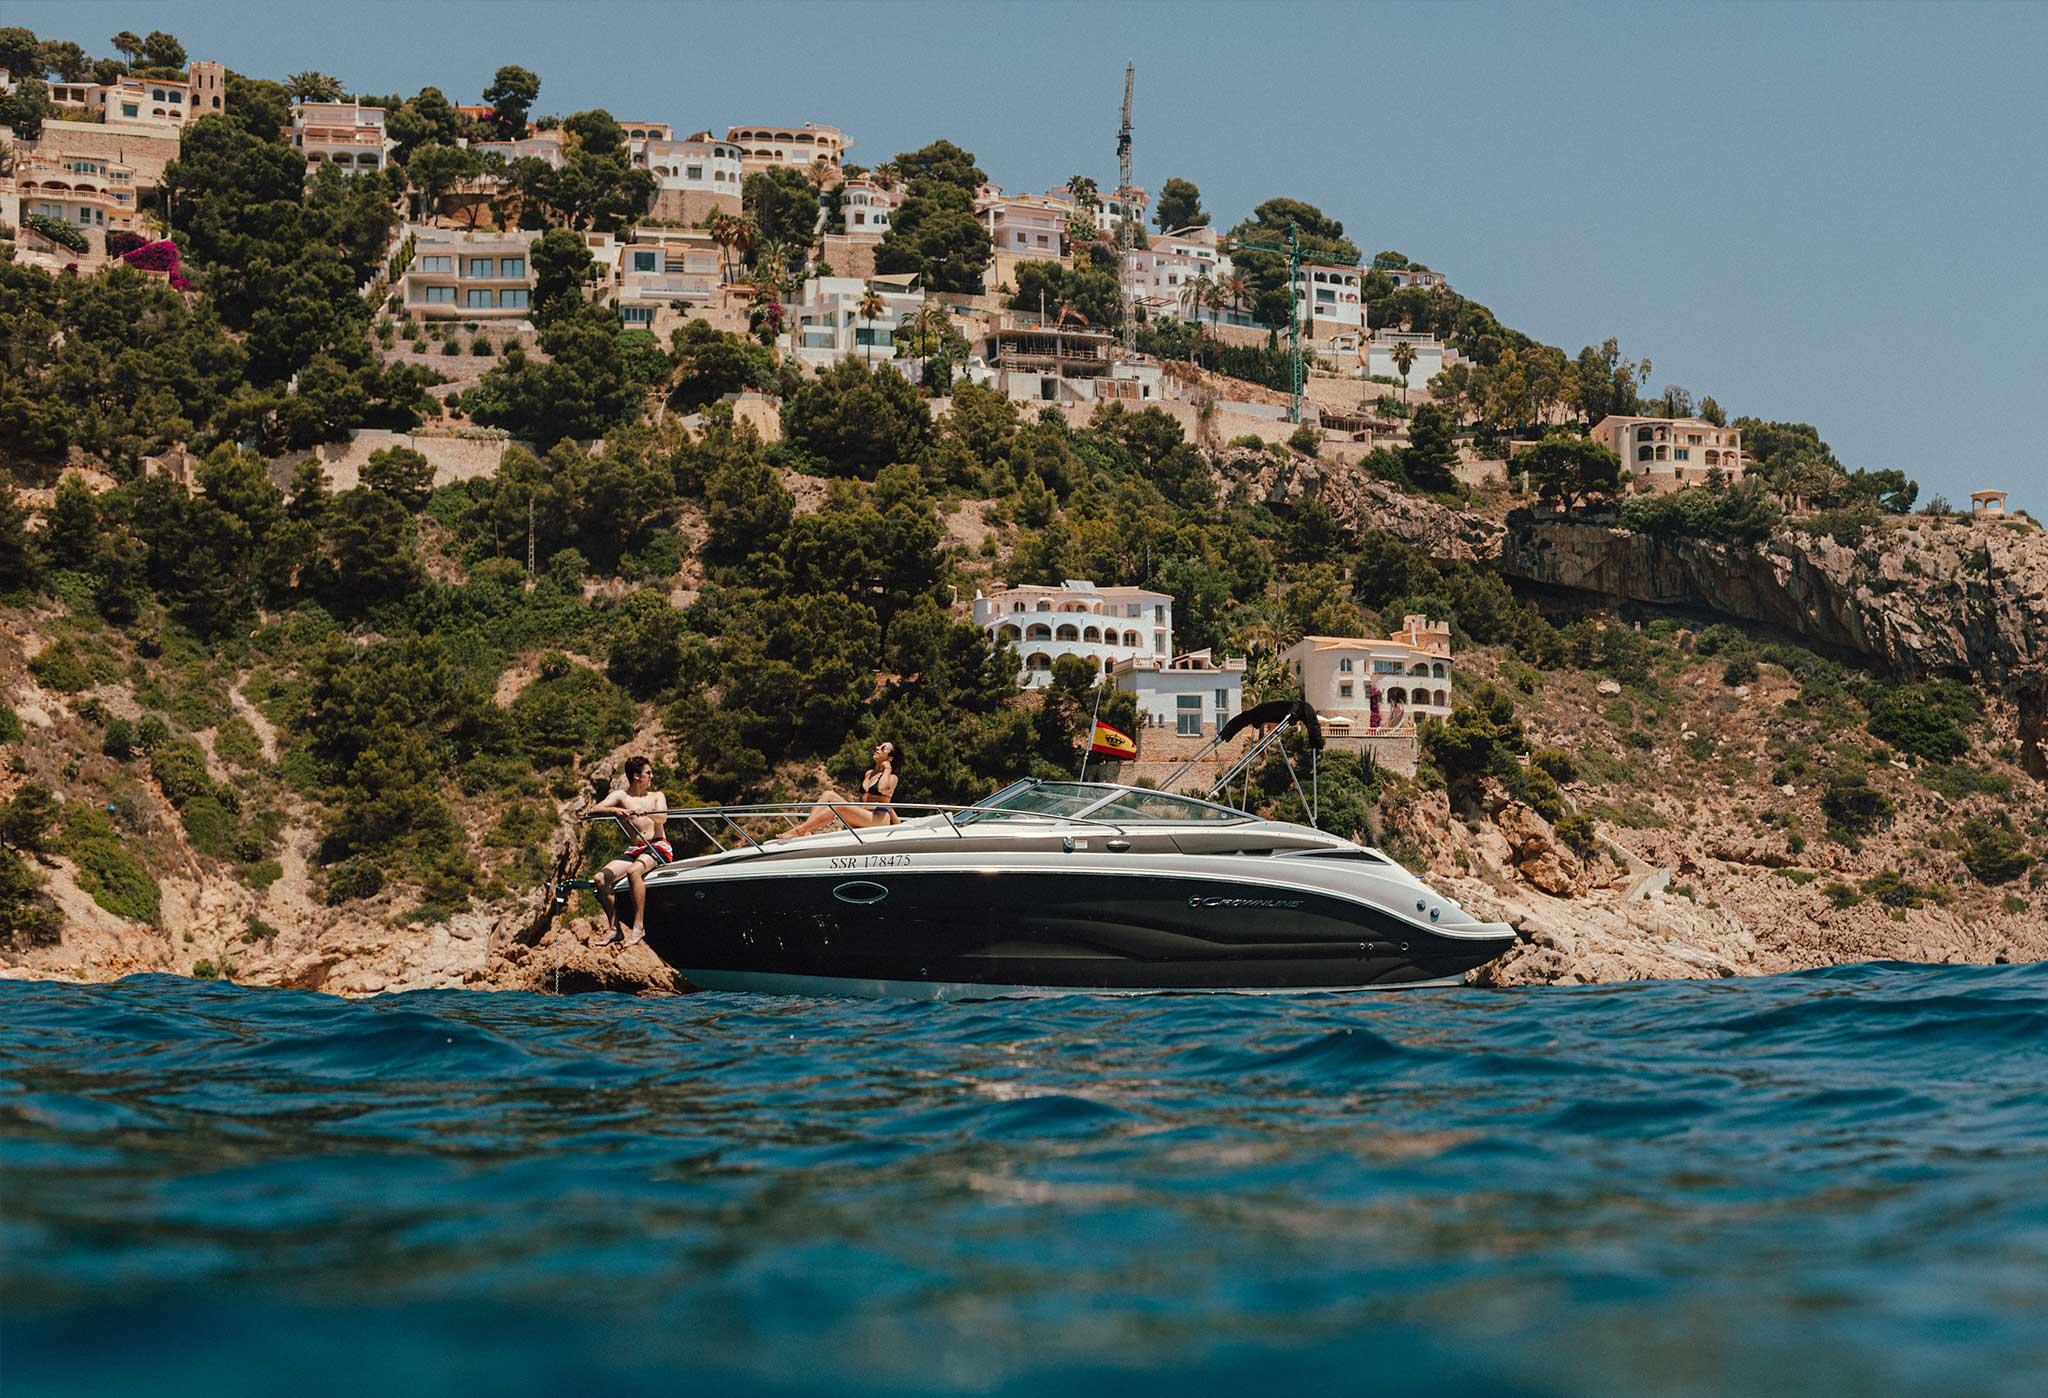 Alquilar barco Denia – Restaurante Nomada